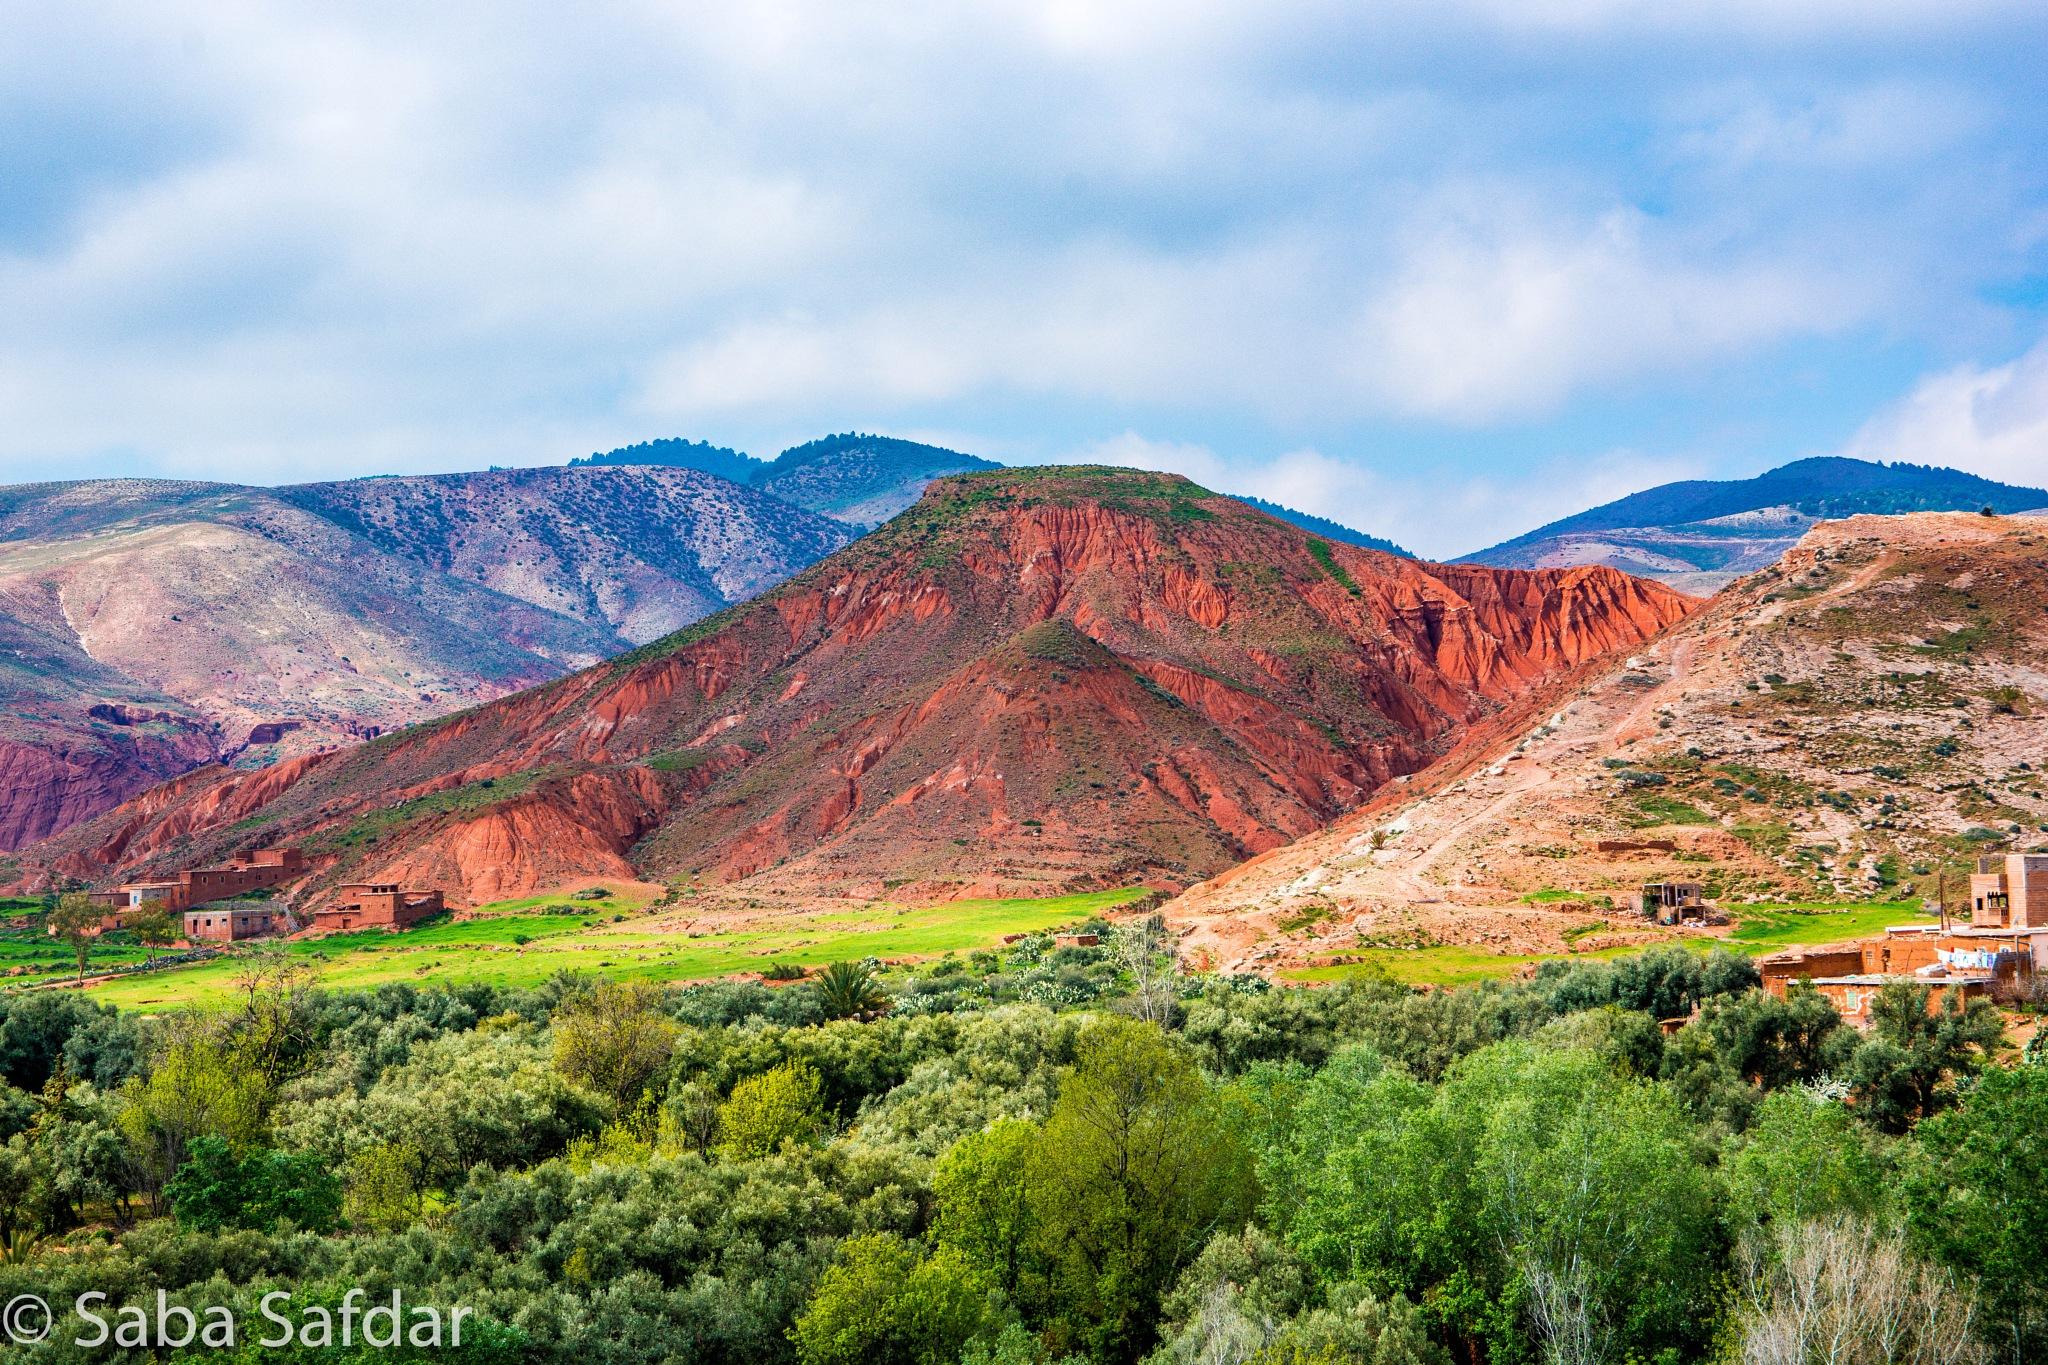 Morocco Landscape by Saba Safdar